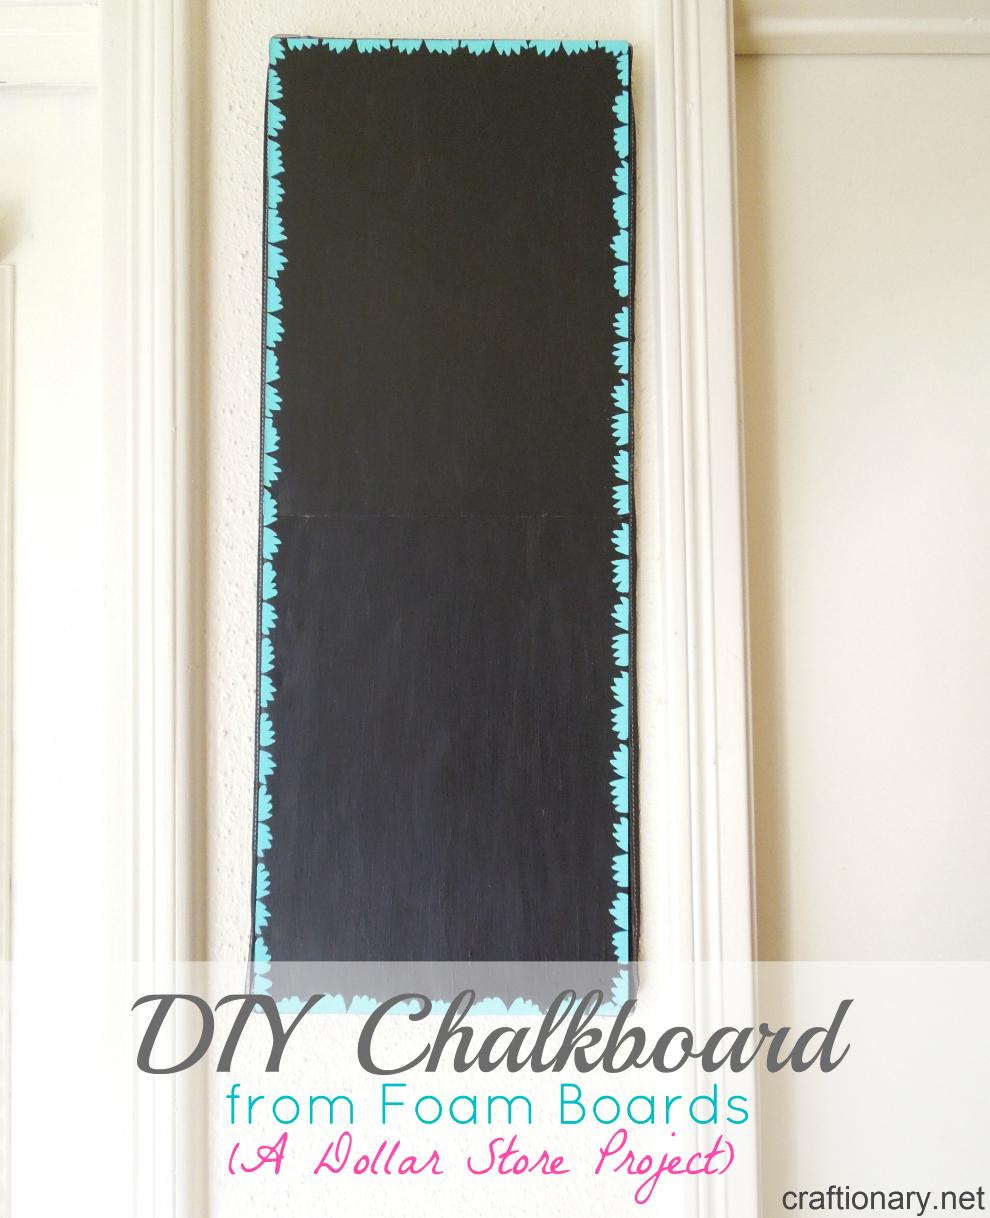 Chaulkboard Paint Art